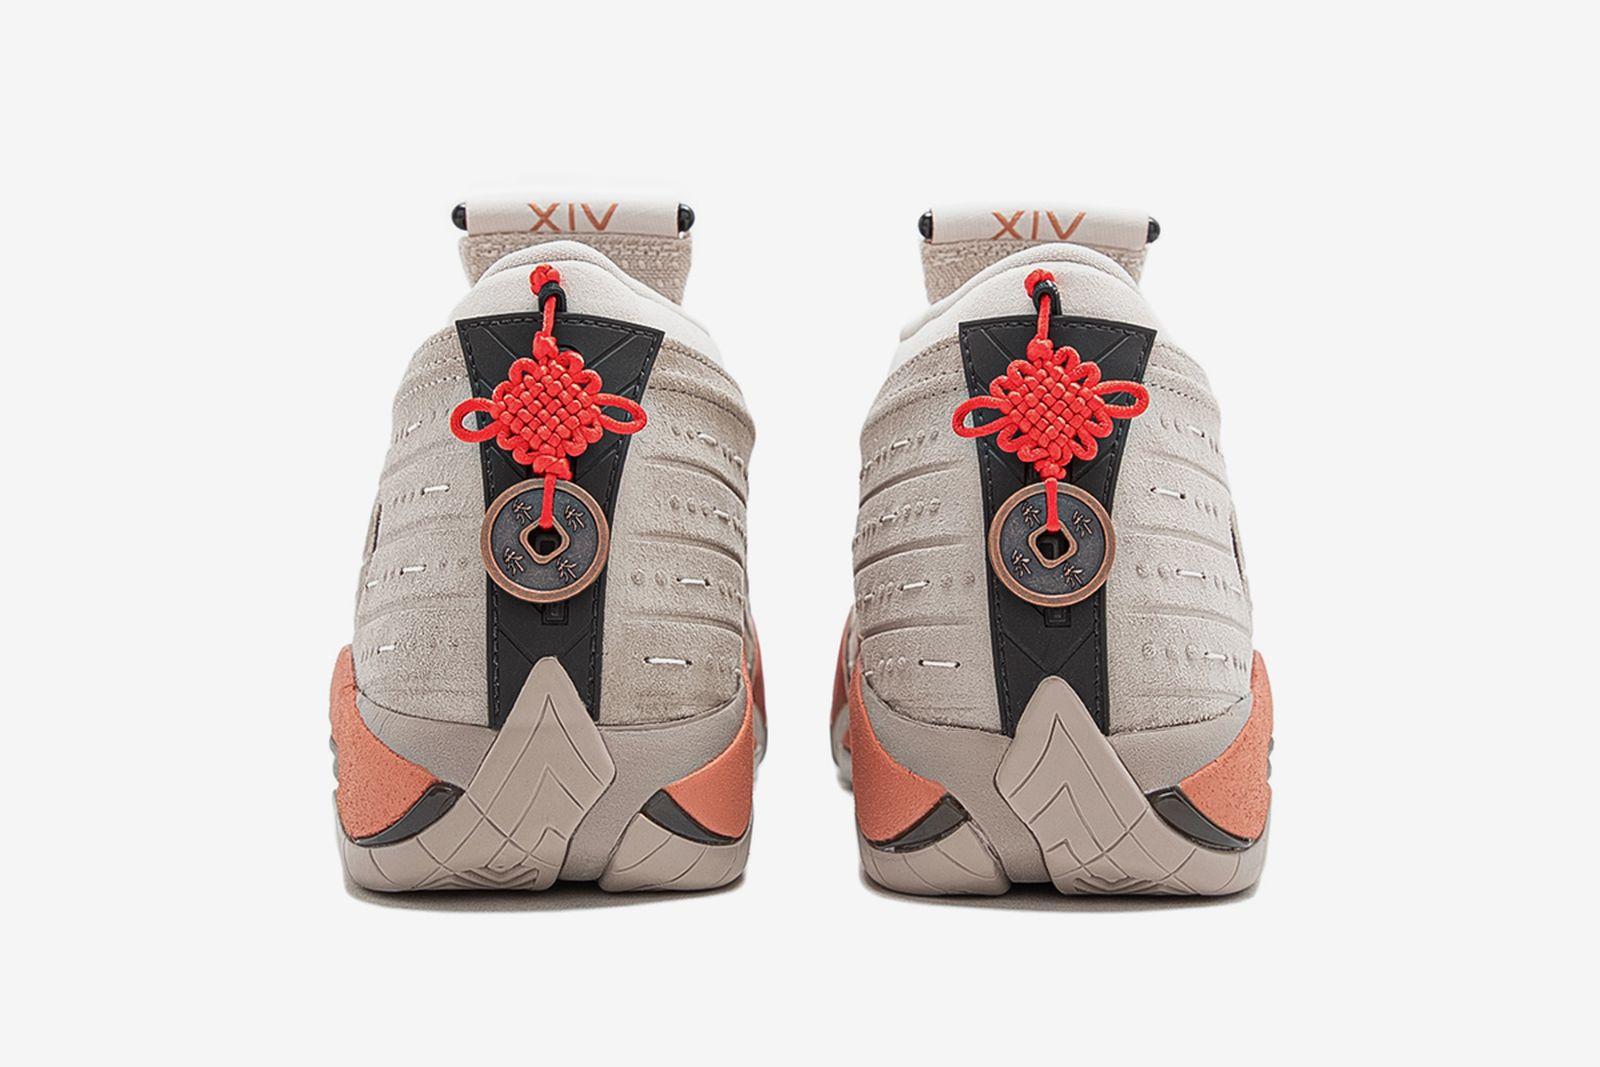 clot-air-jordan-14-low-terracotta-release-info-1-02